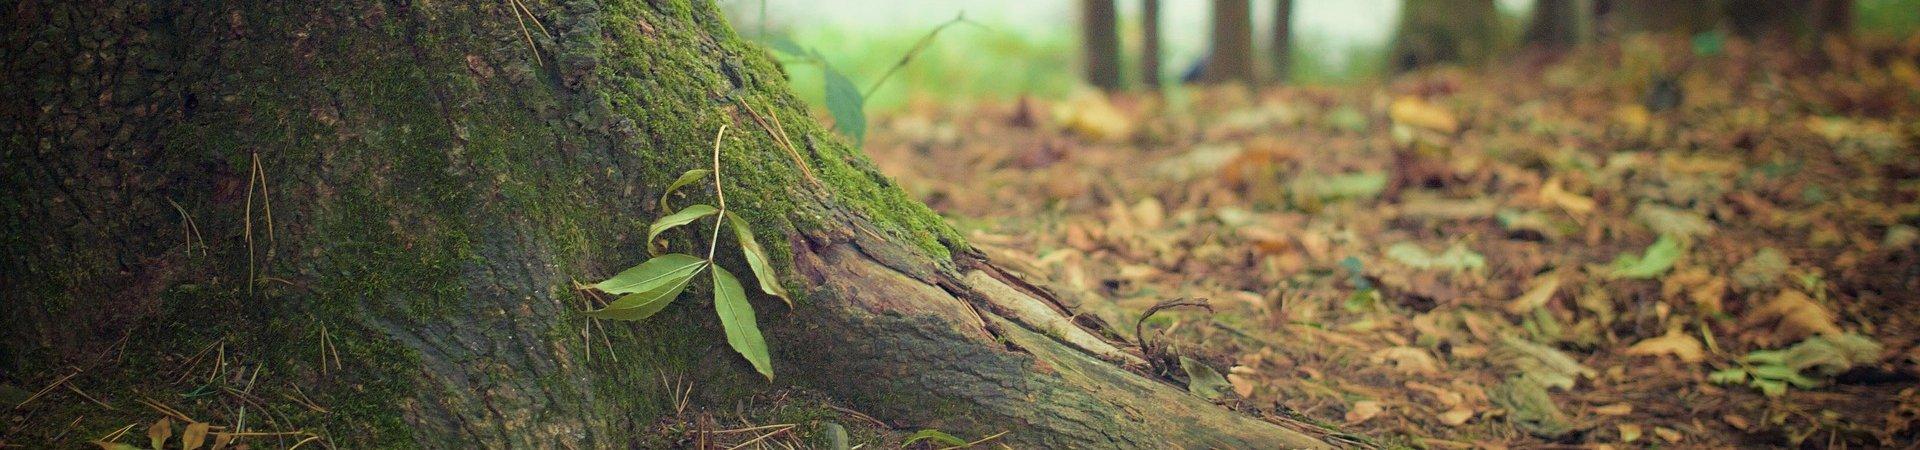 tree-trunk-569275_1920-aspect-ratio-x